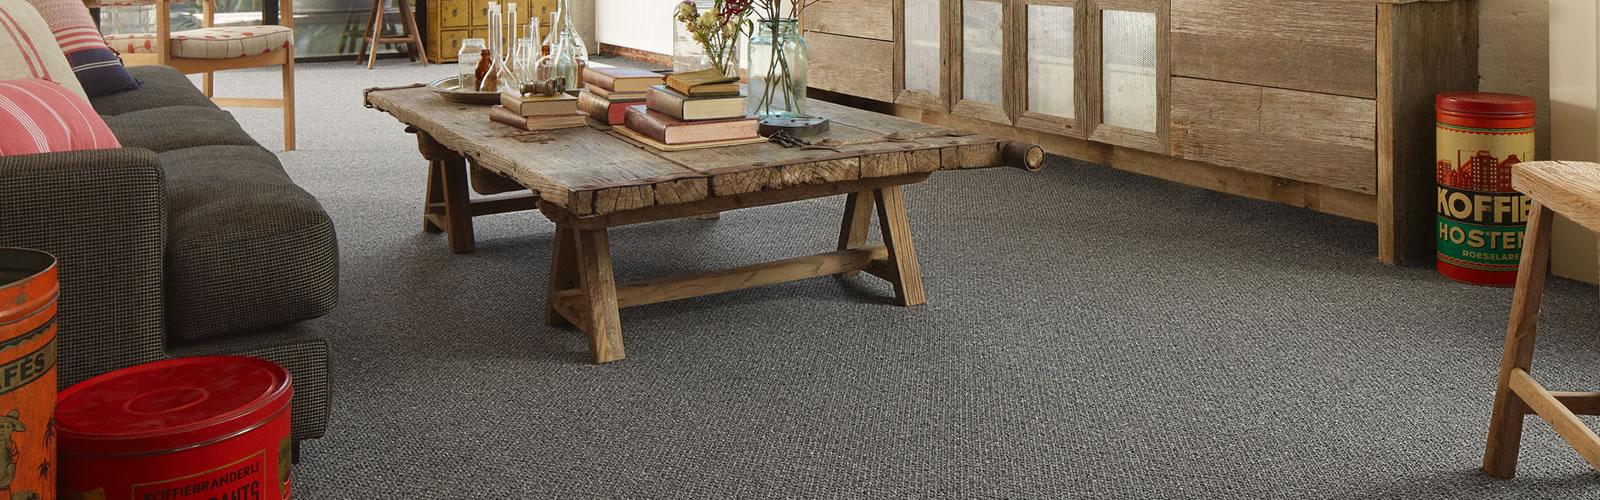 carpet stores adelaide